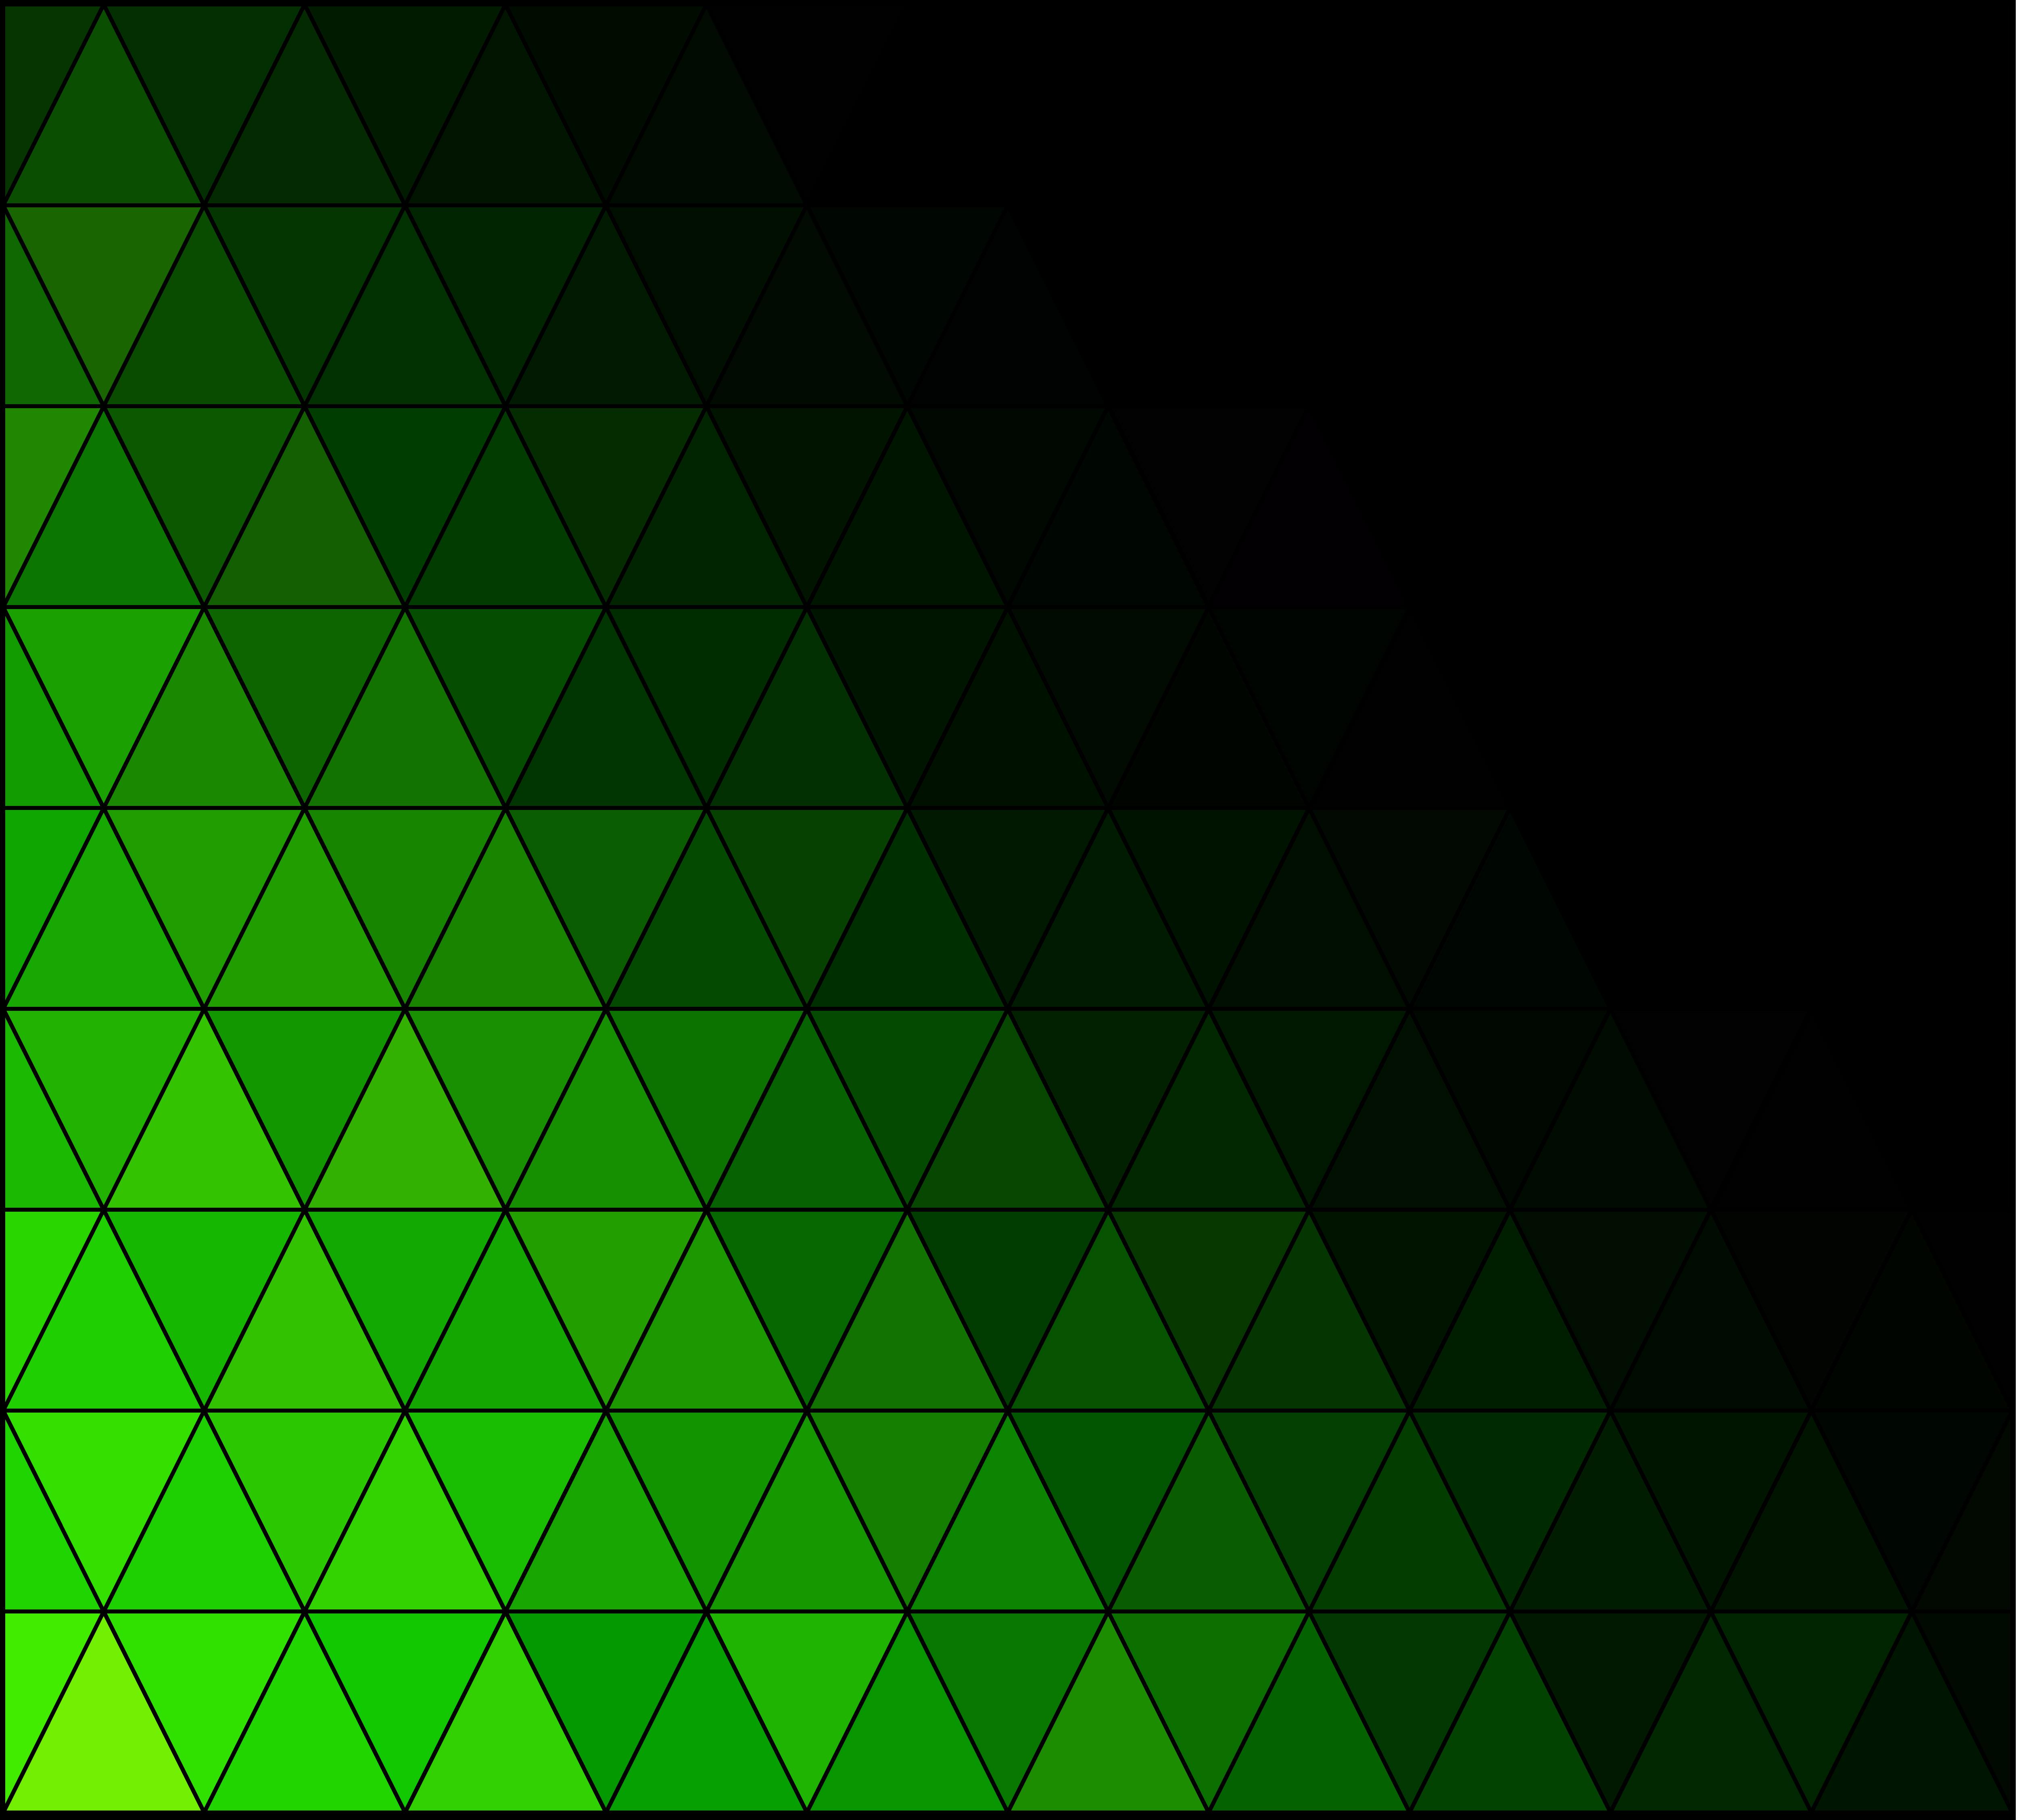 Green Square Grid Mosaic Background, Creative Design